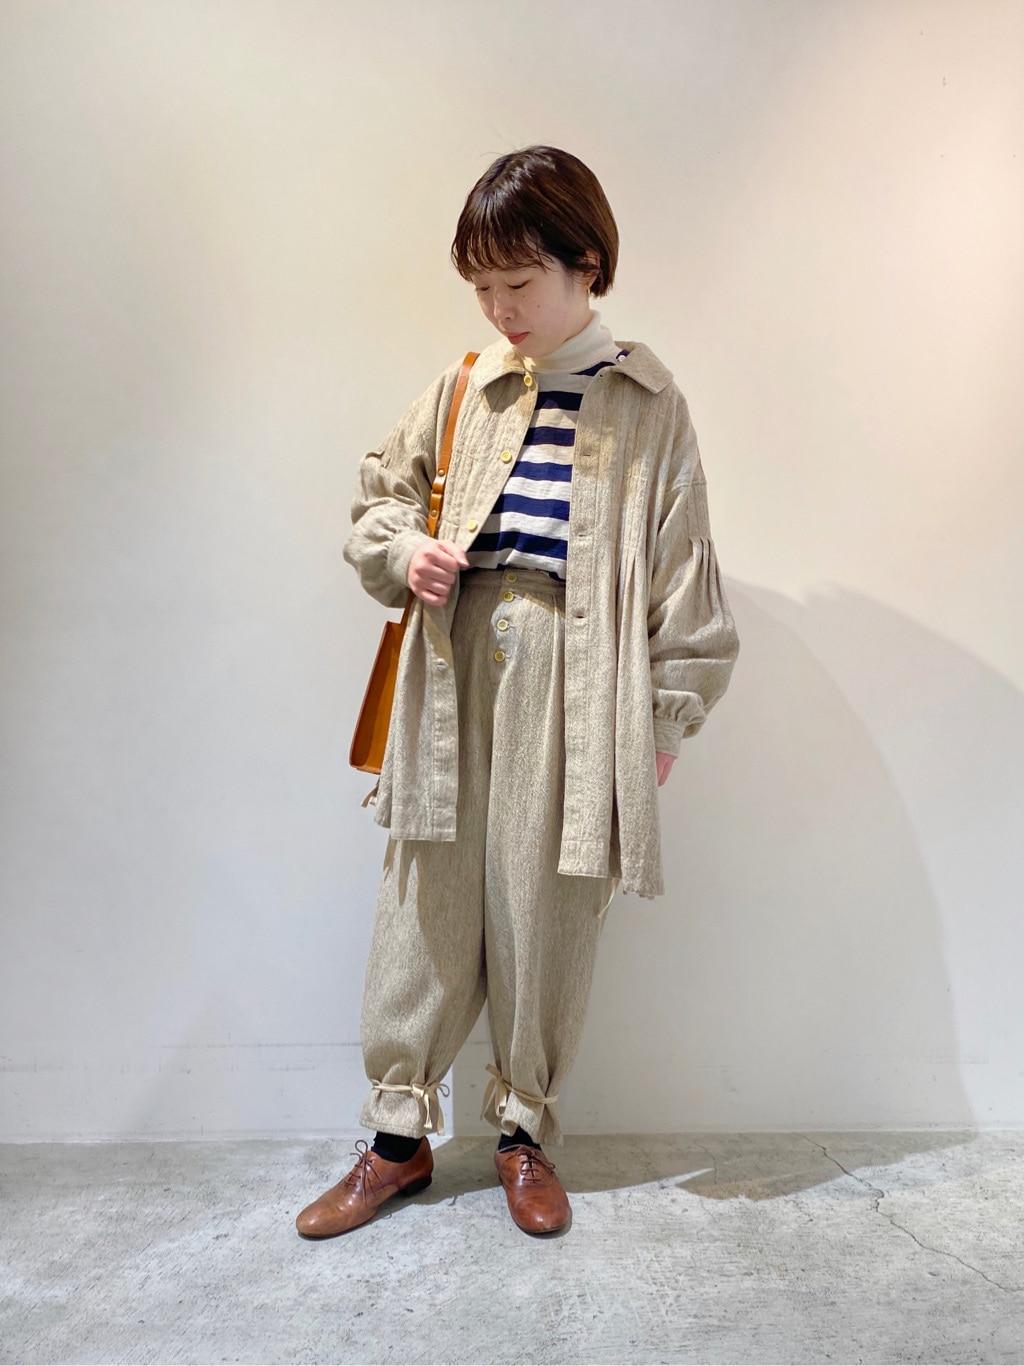 chambre de charme 京都路面 身長:150cm 2020.11.25